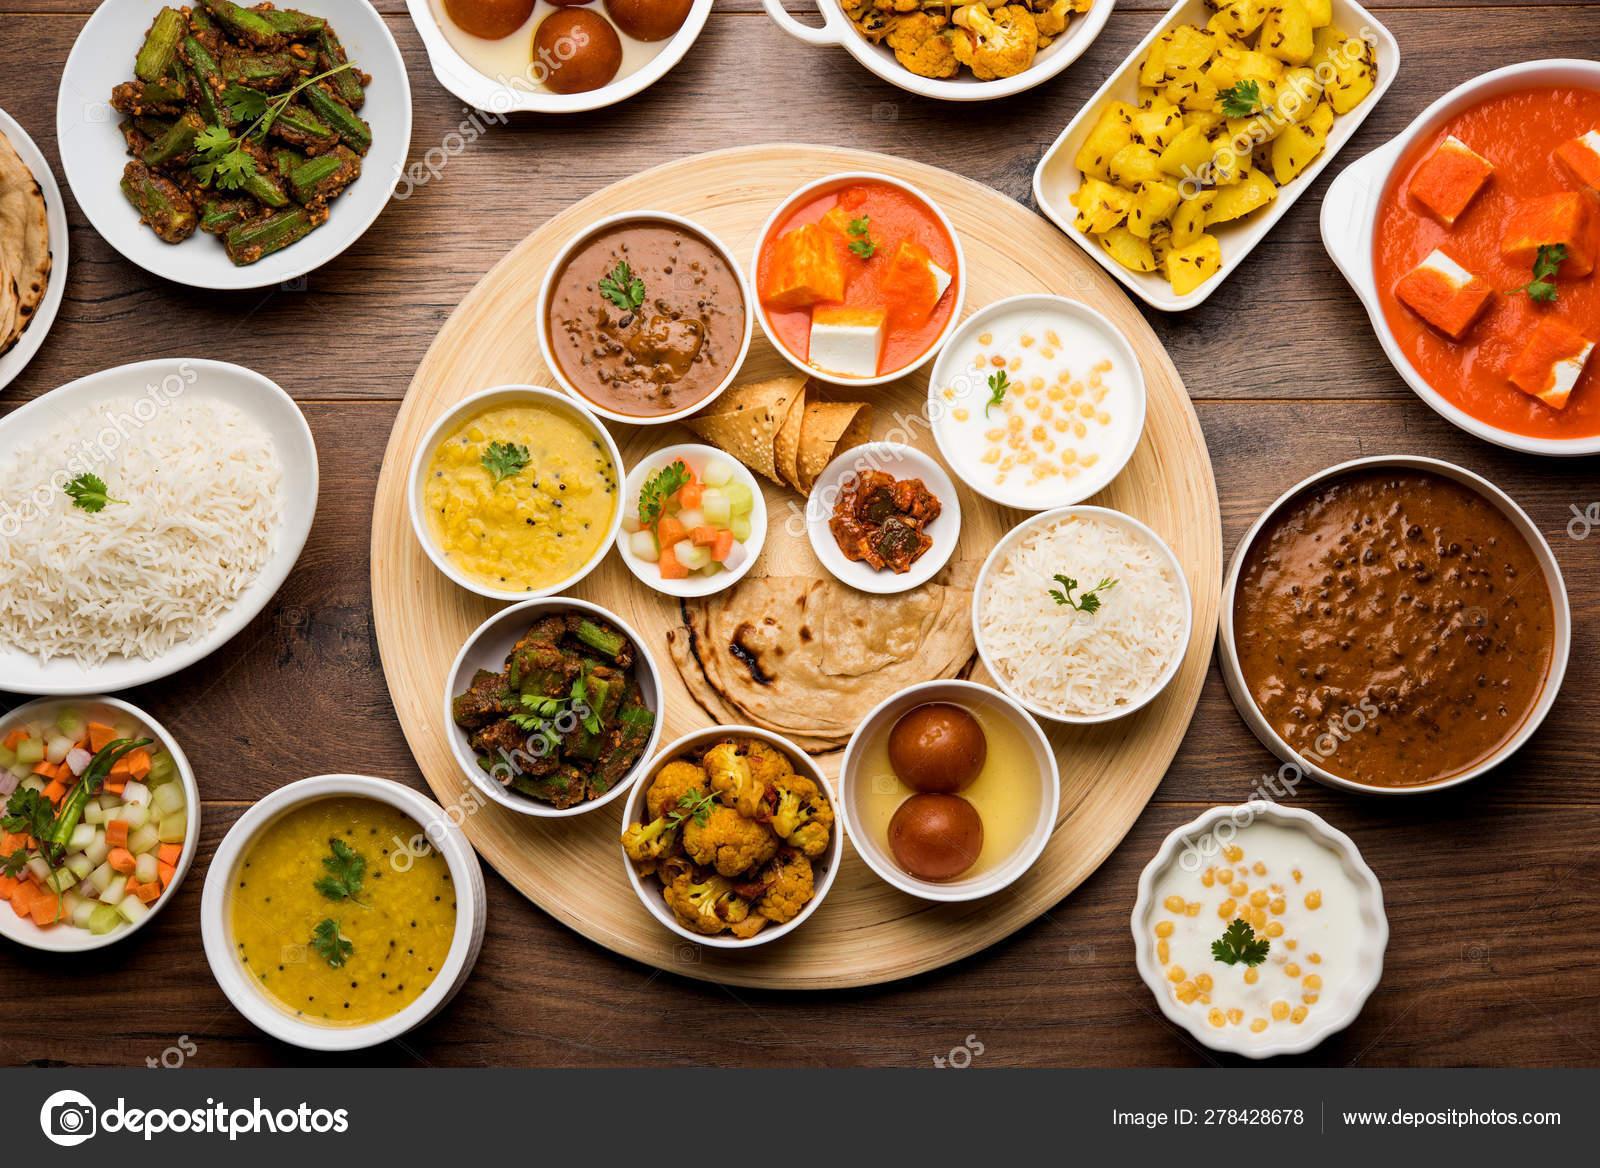 Indian Food Platter Hindu Veg Thali Selective Focus Stock Photo Image By C Arundhati Callistainteriors In 278428678